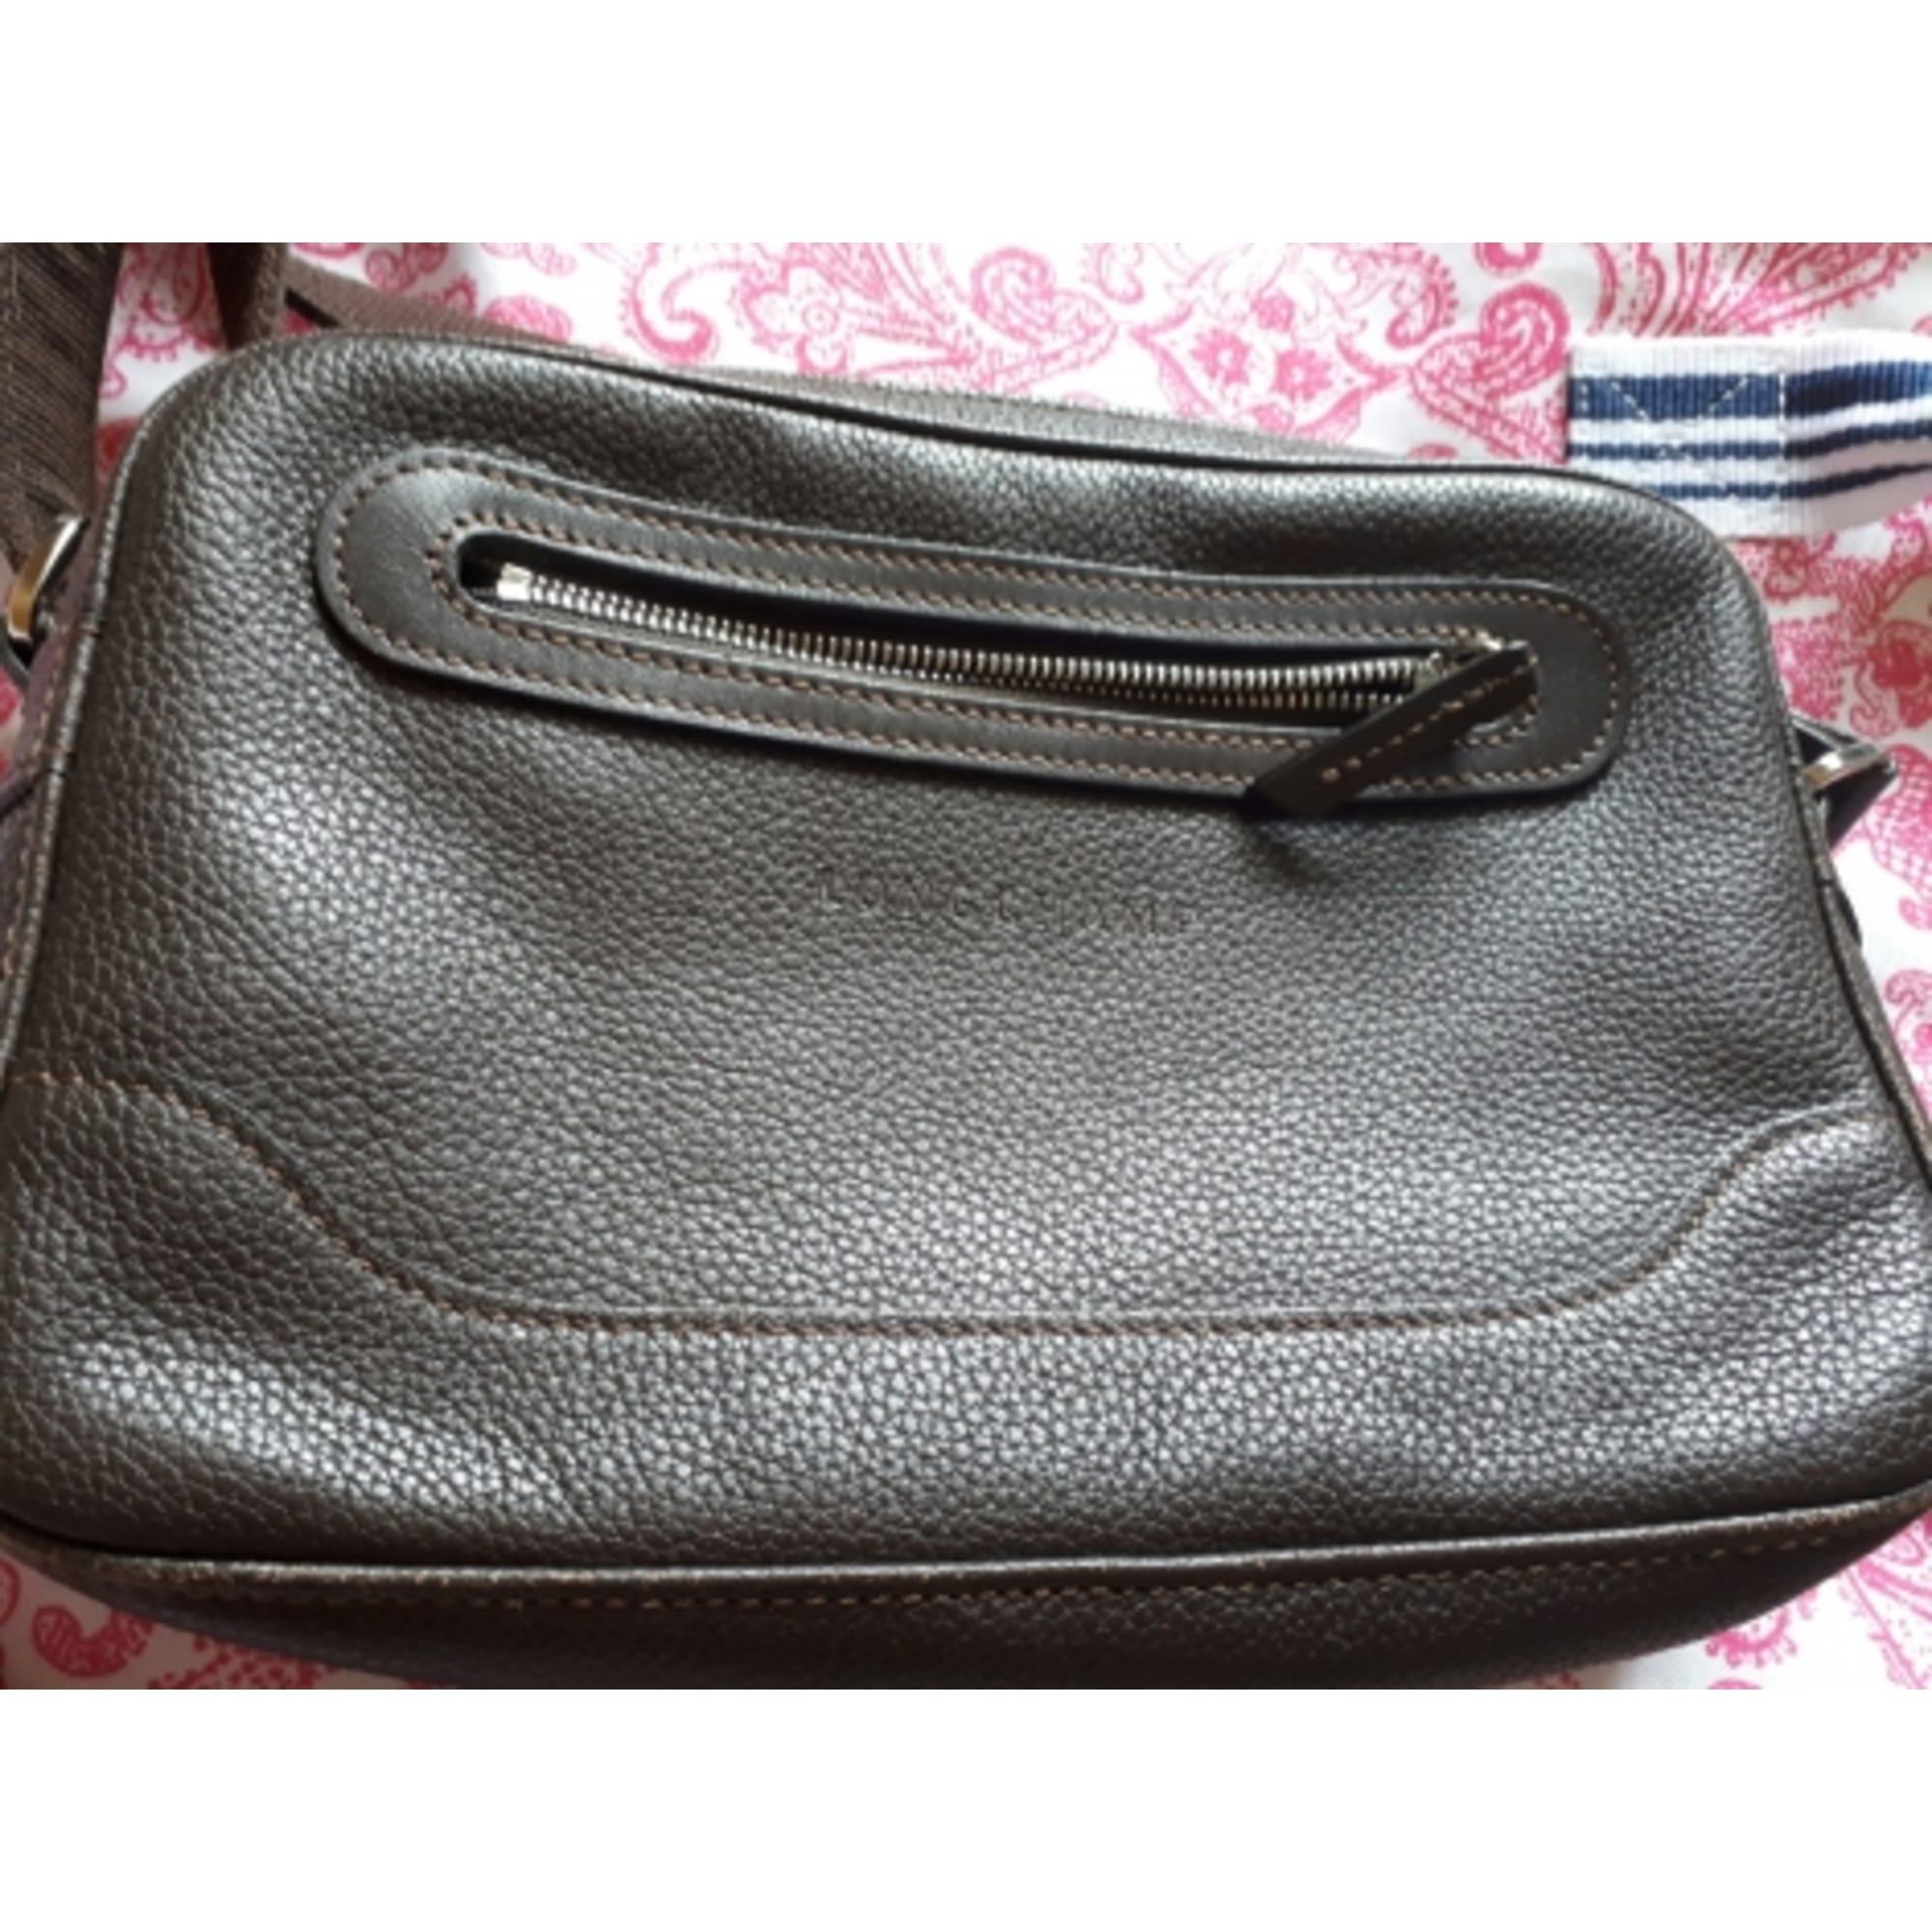 in marrone pelle Longchamp da Marion tracolla a venduta Borsa xq4Att